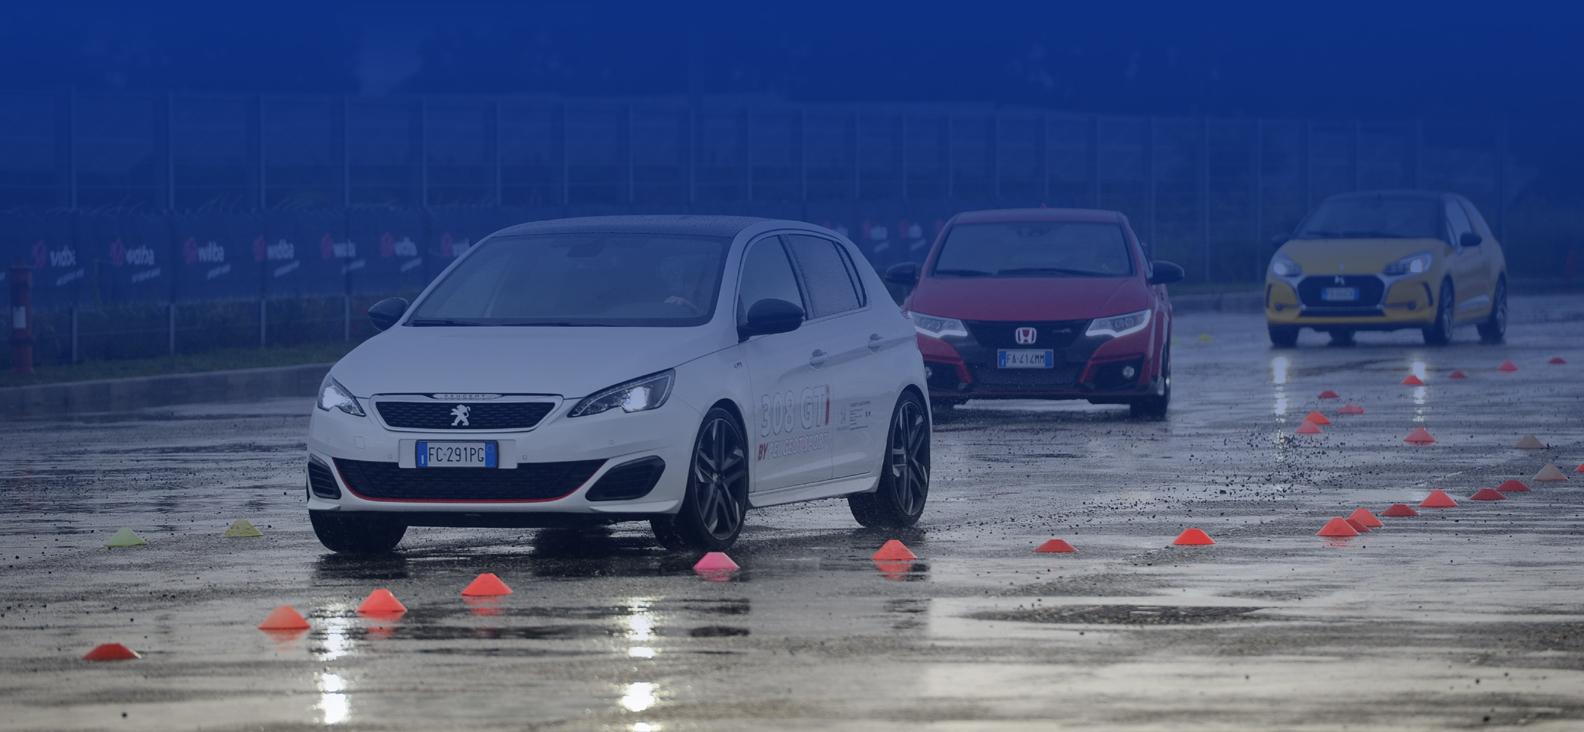 Roma Motor Show 2016 Vallelunga 15.05.2016   Nella foto: area test